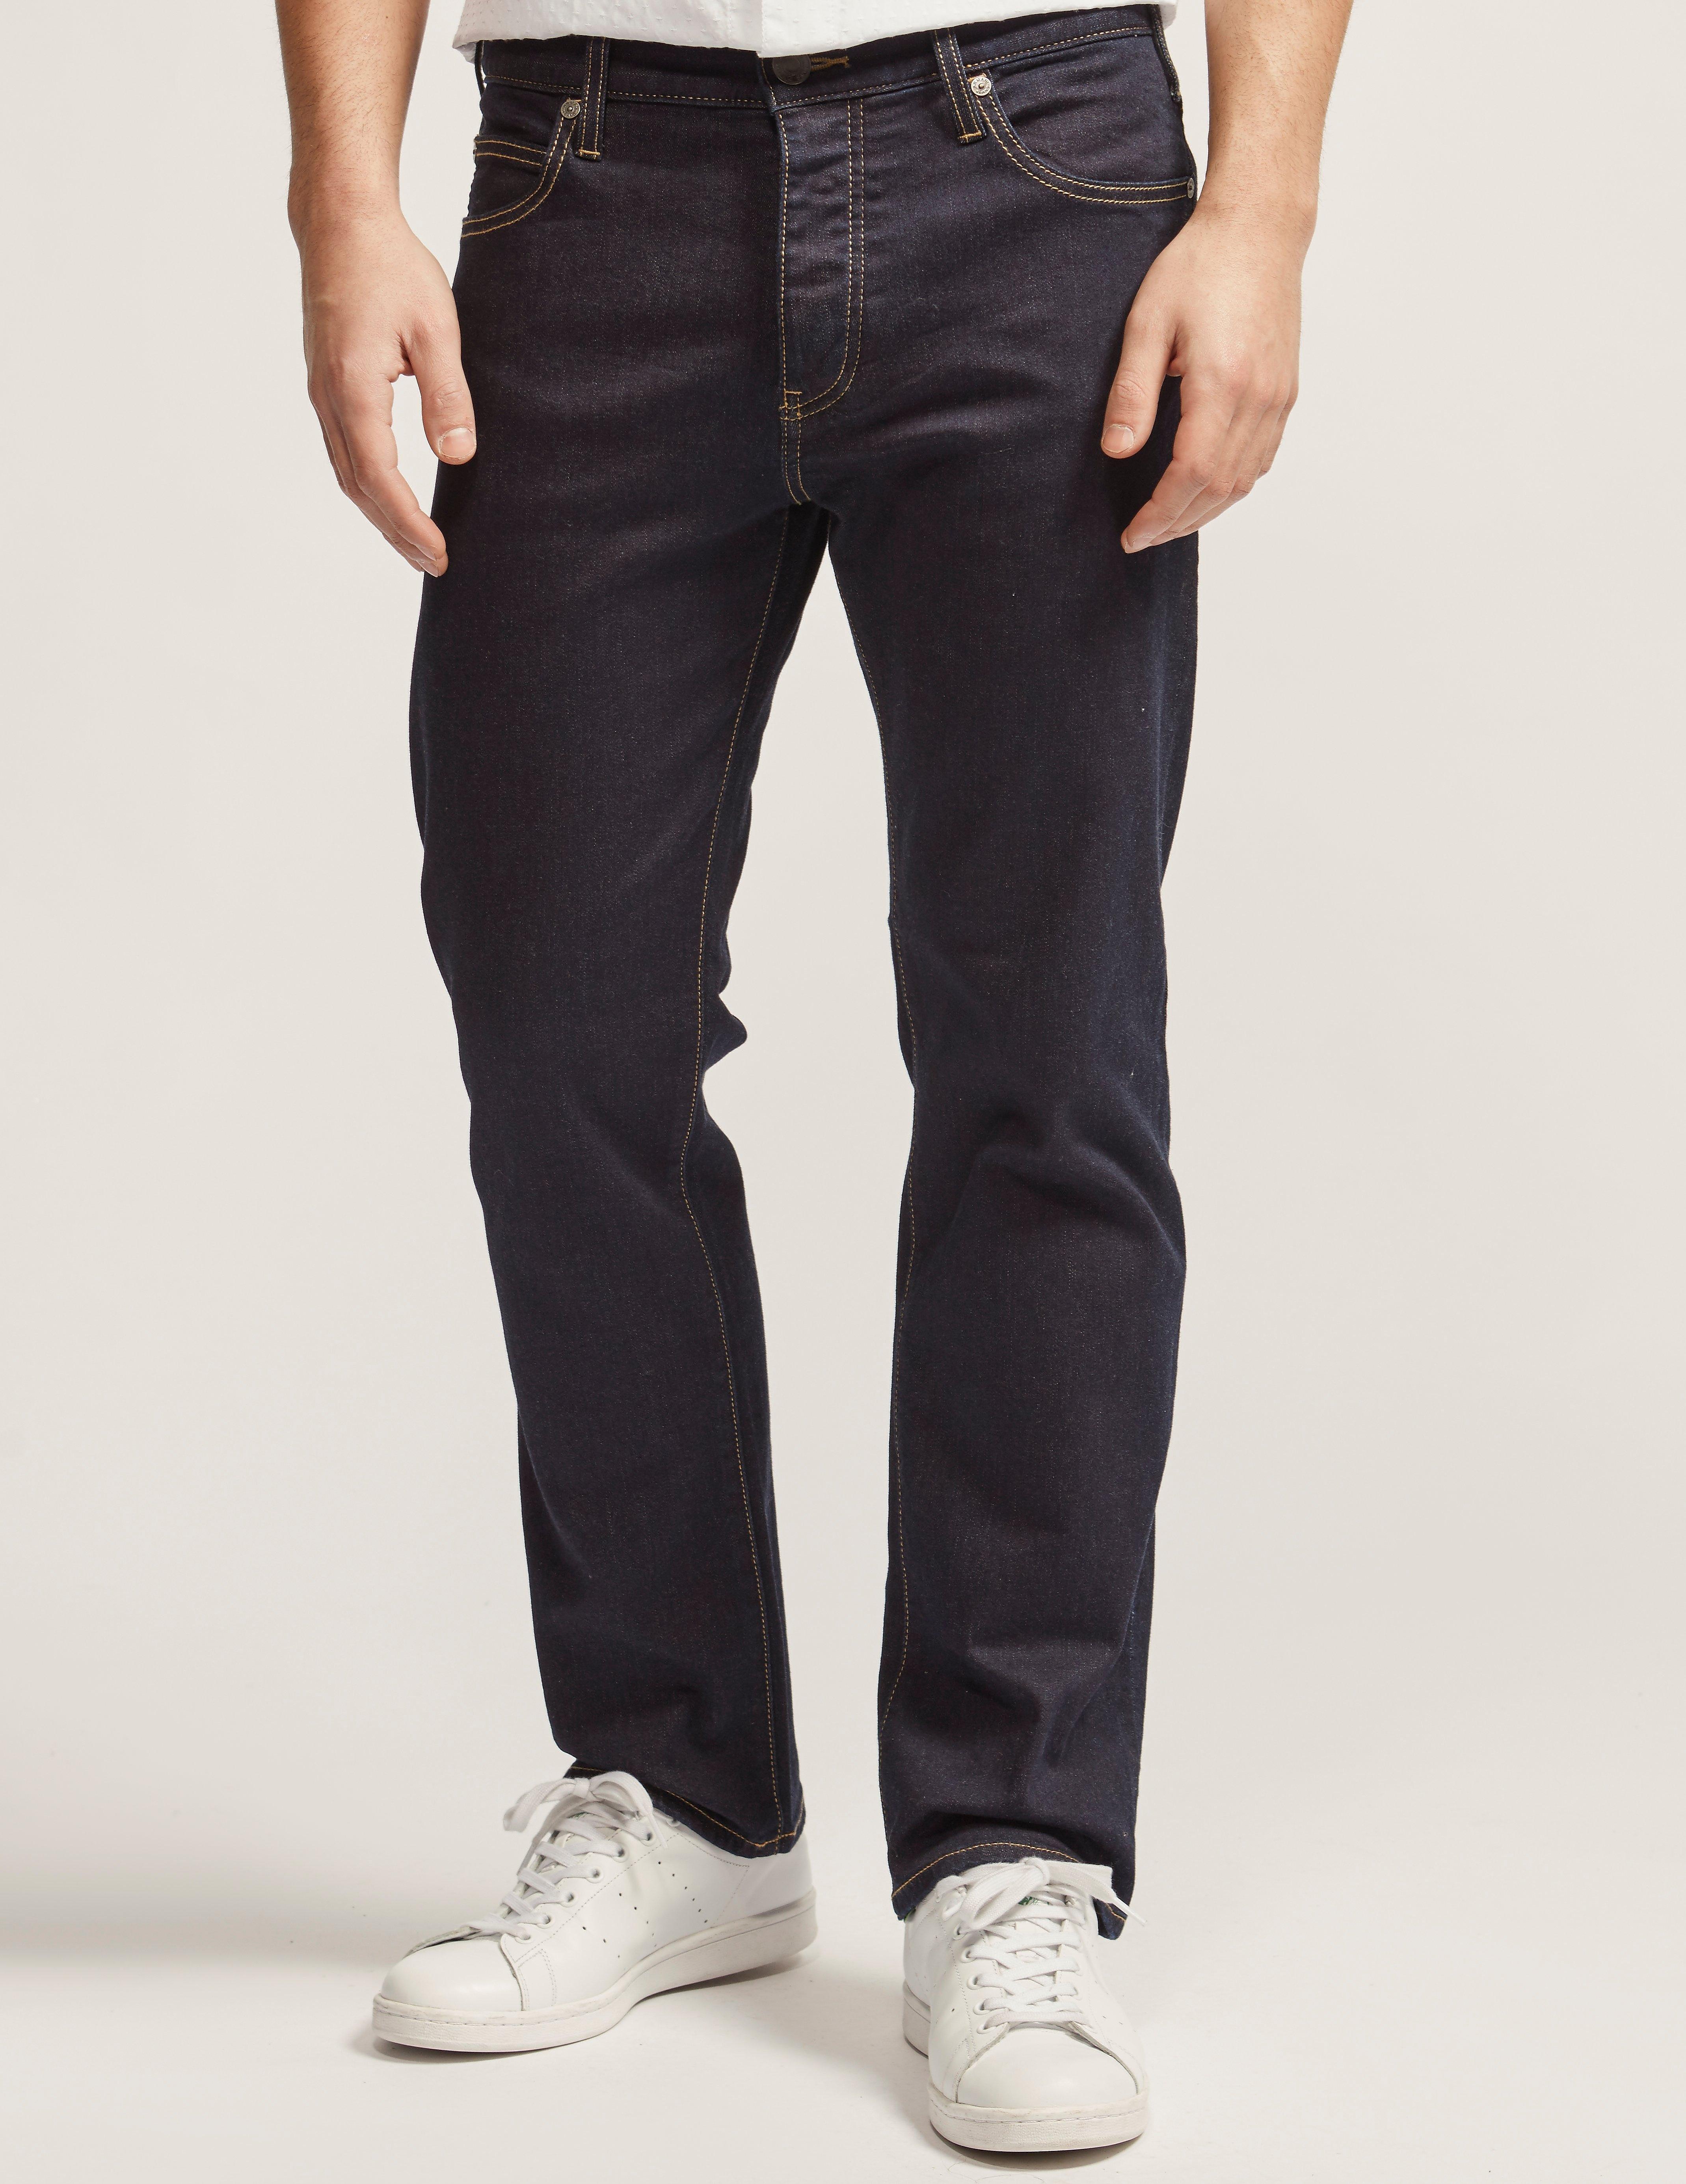 Armani Jeans J21 Jeans - Long Length